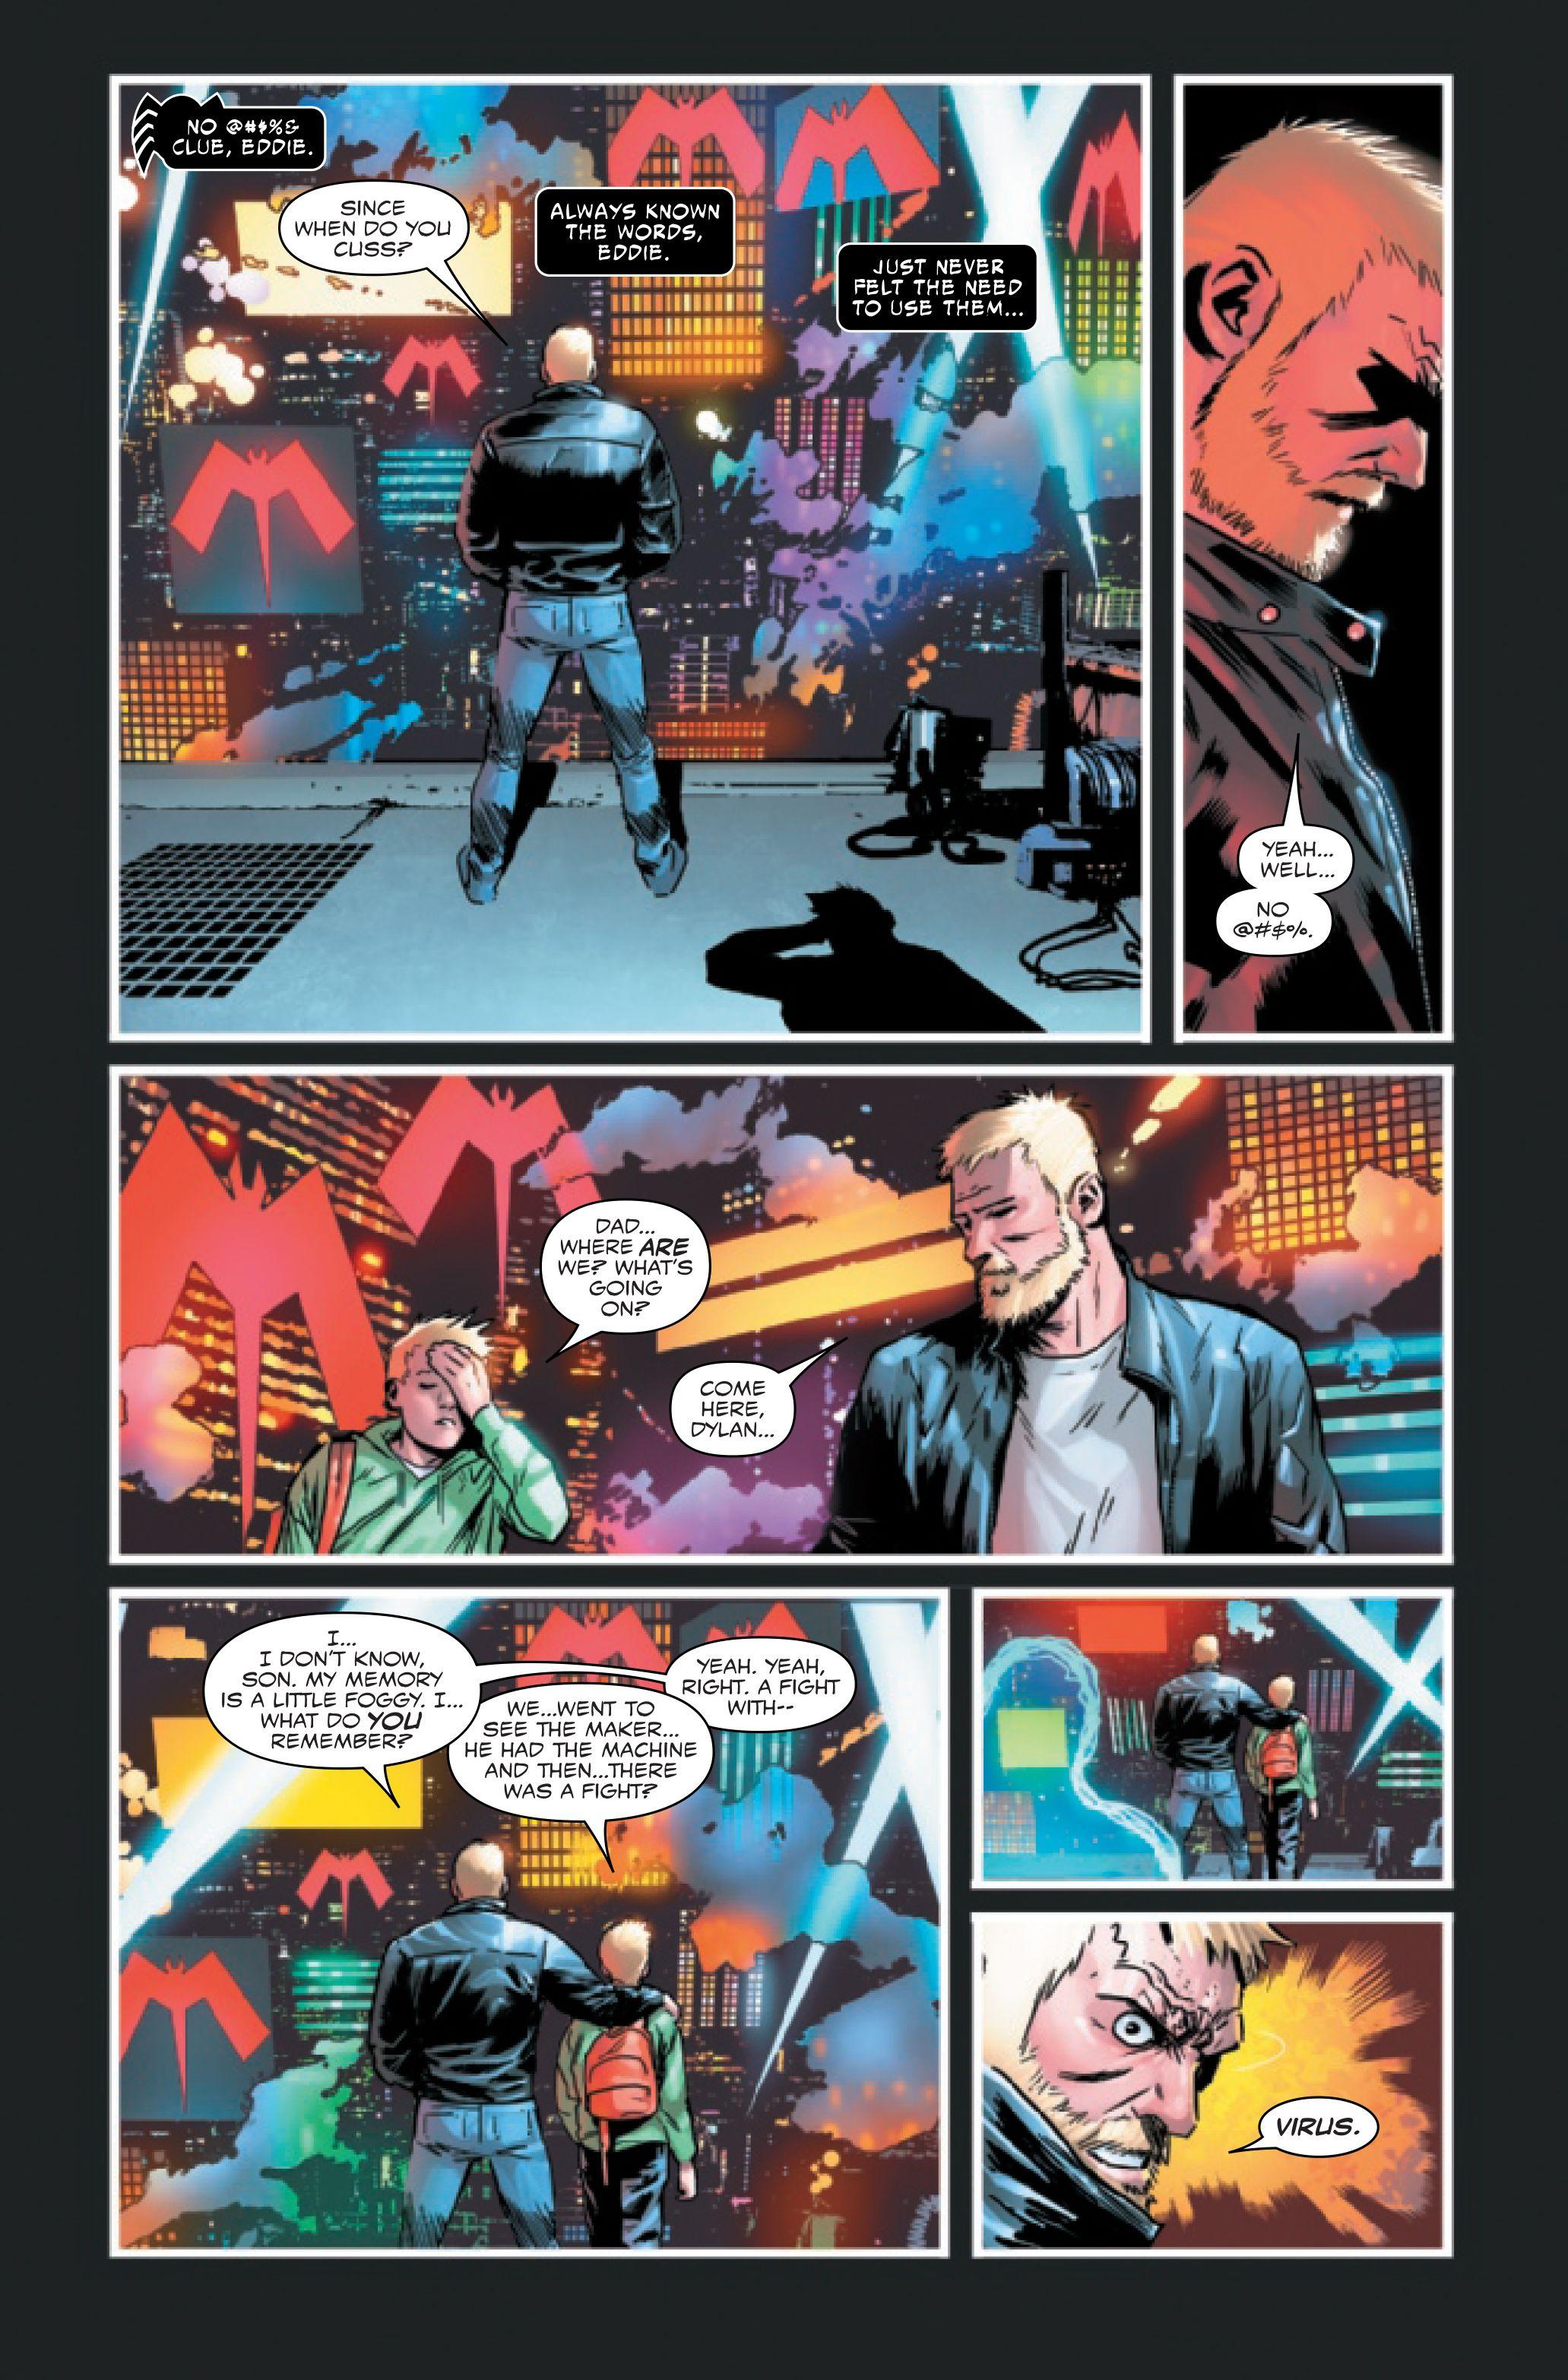 Venom: Simbiote alienígena de Eddie Brock [SPOILER] e Ed pela primeira vez 4